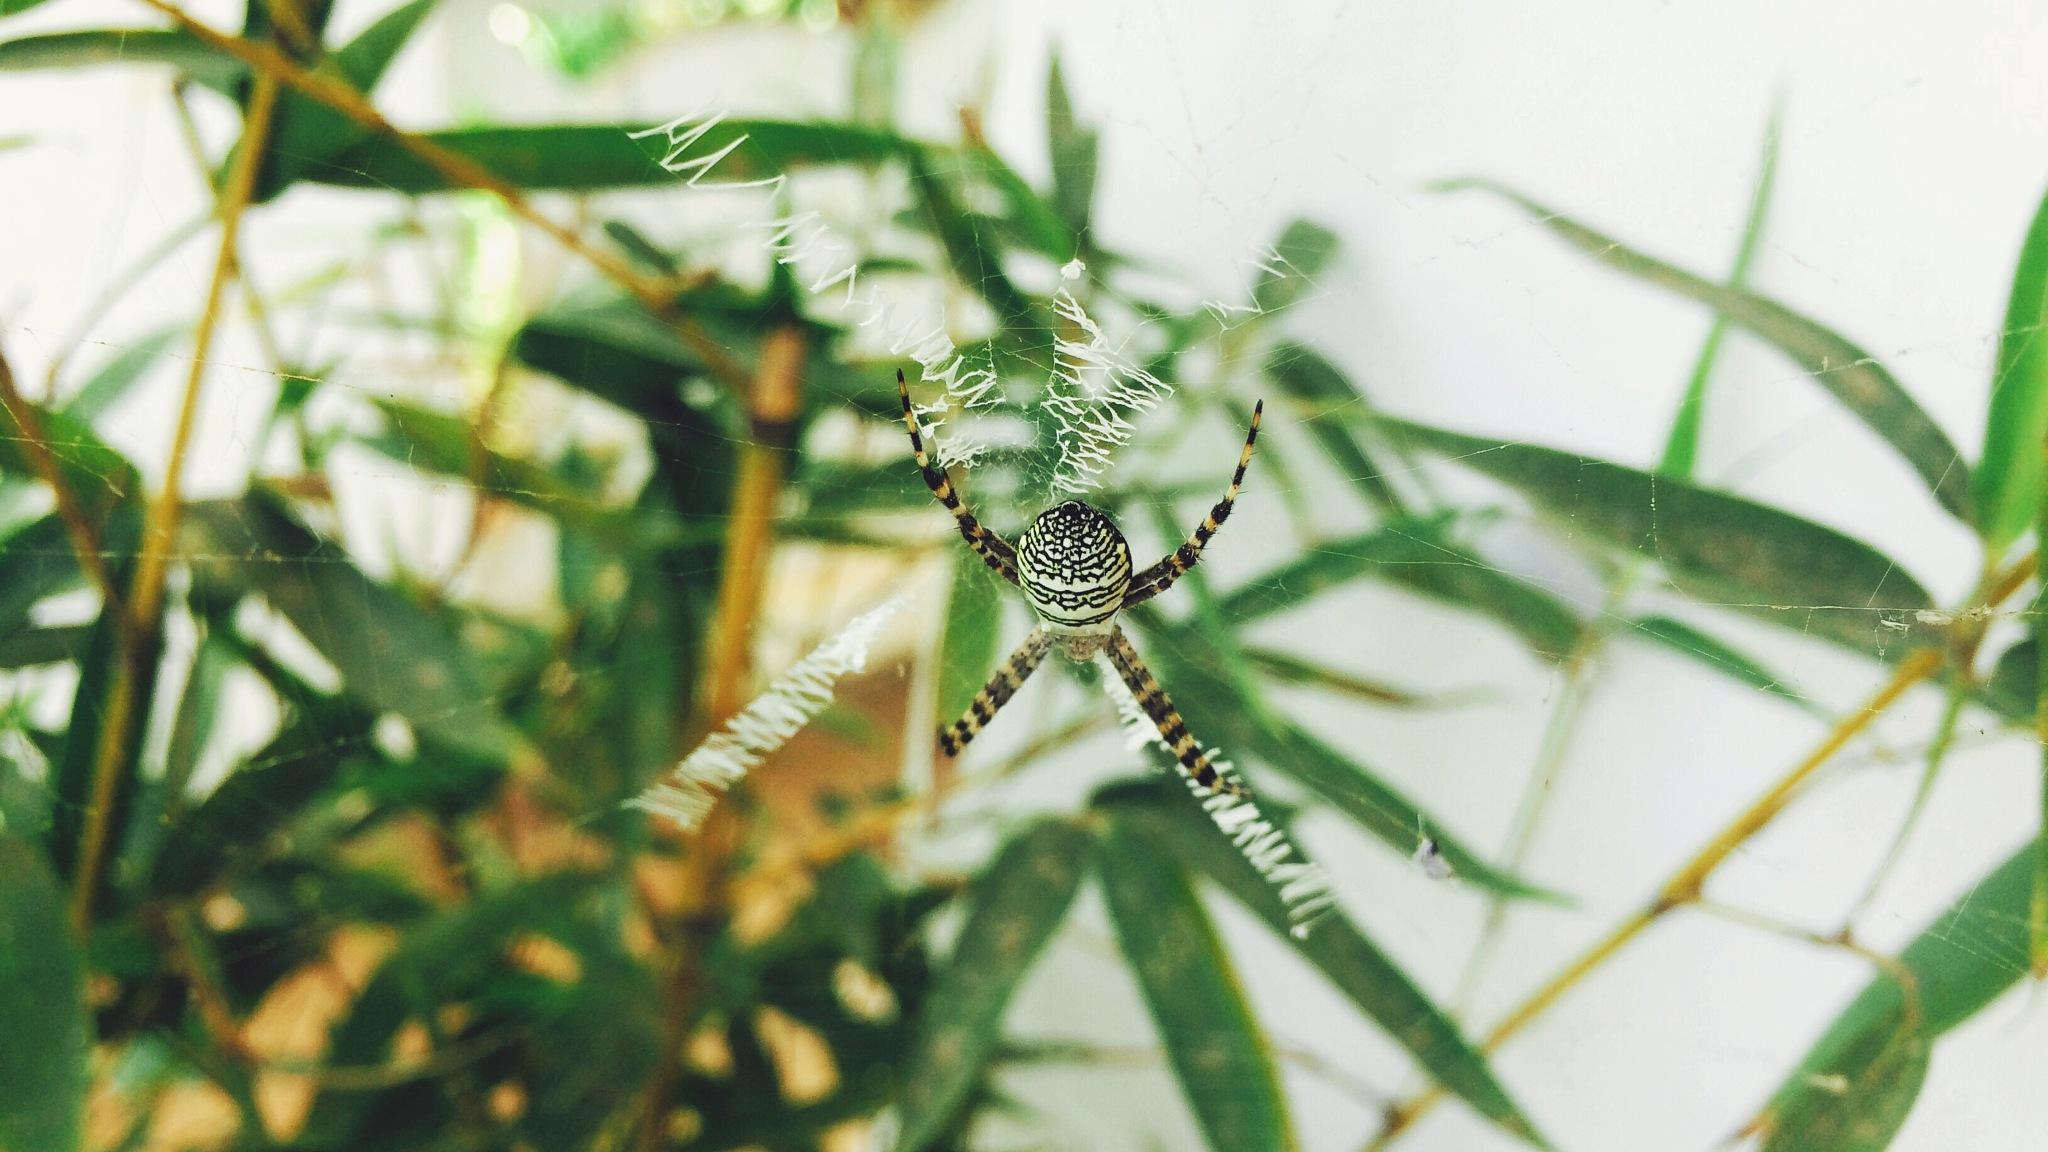 Spider by Abdullah Azhar